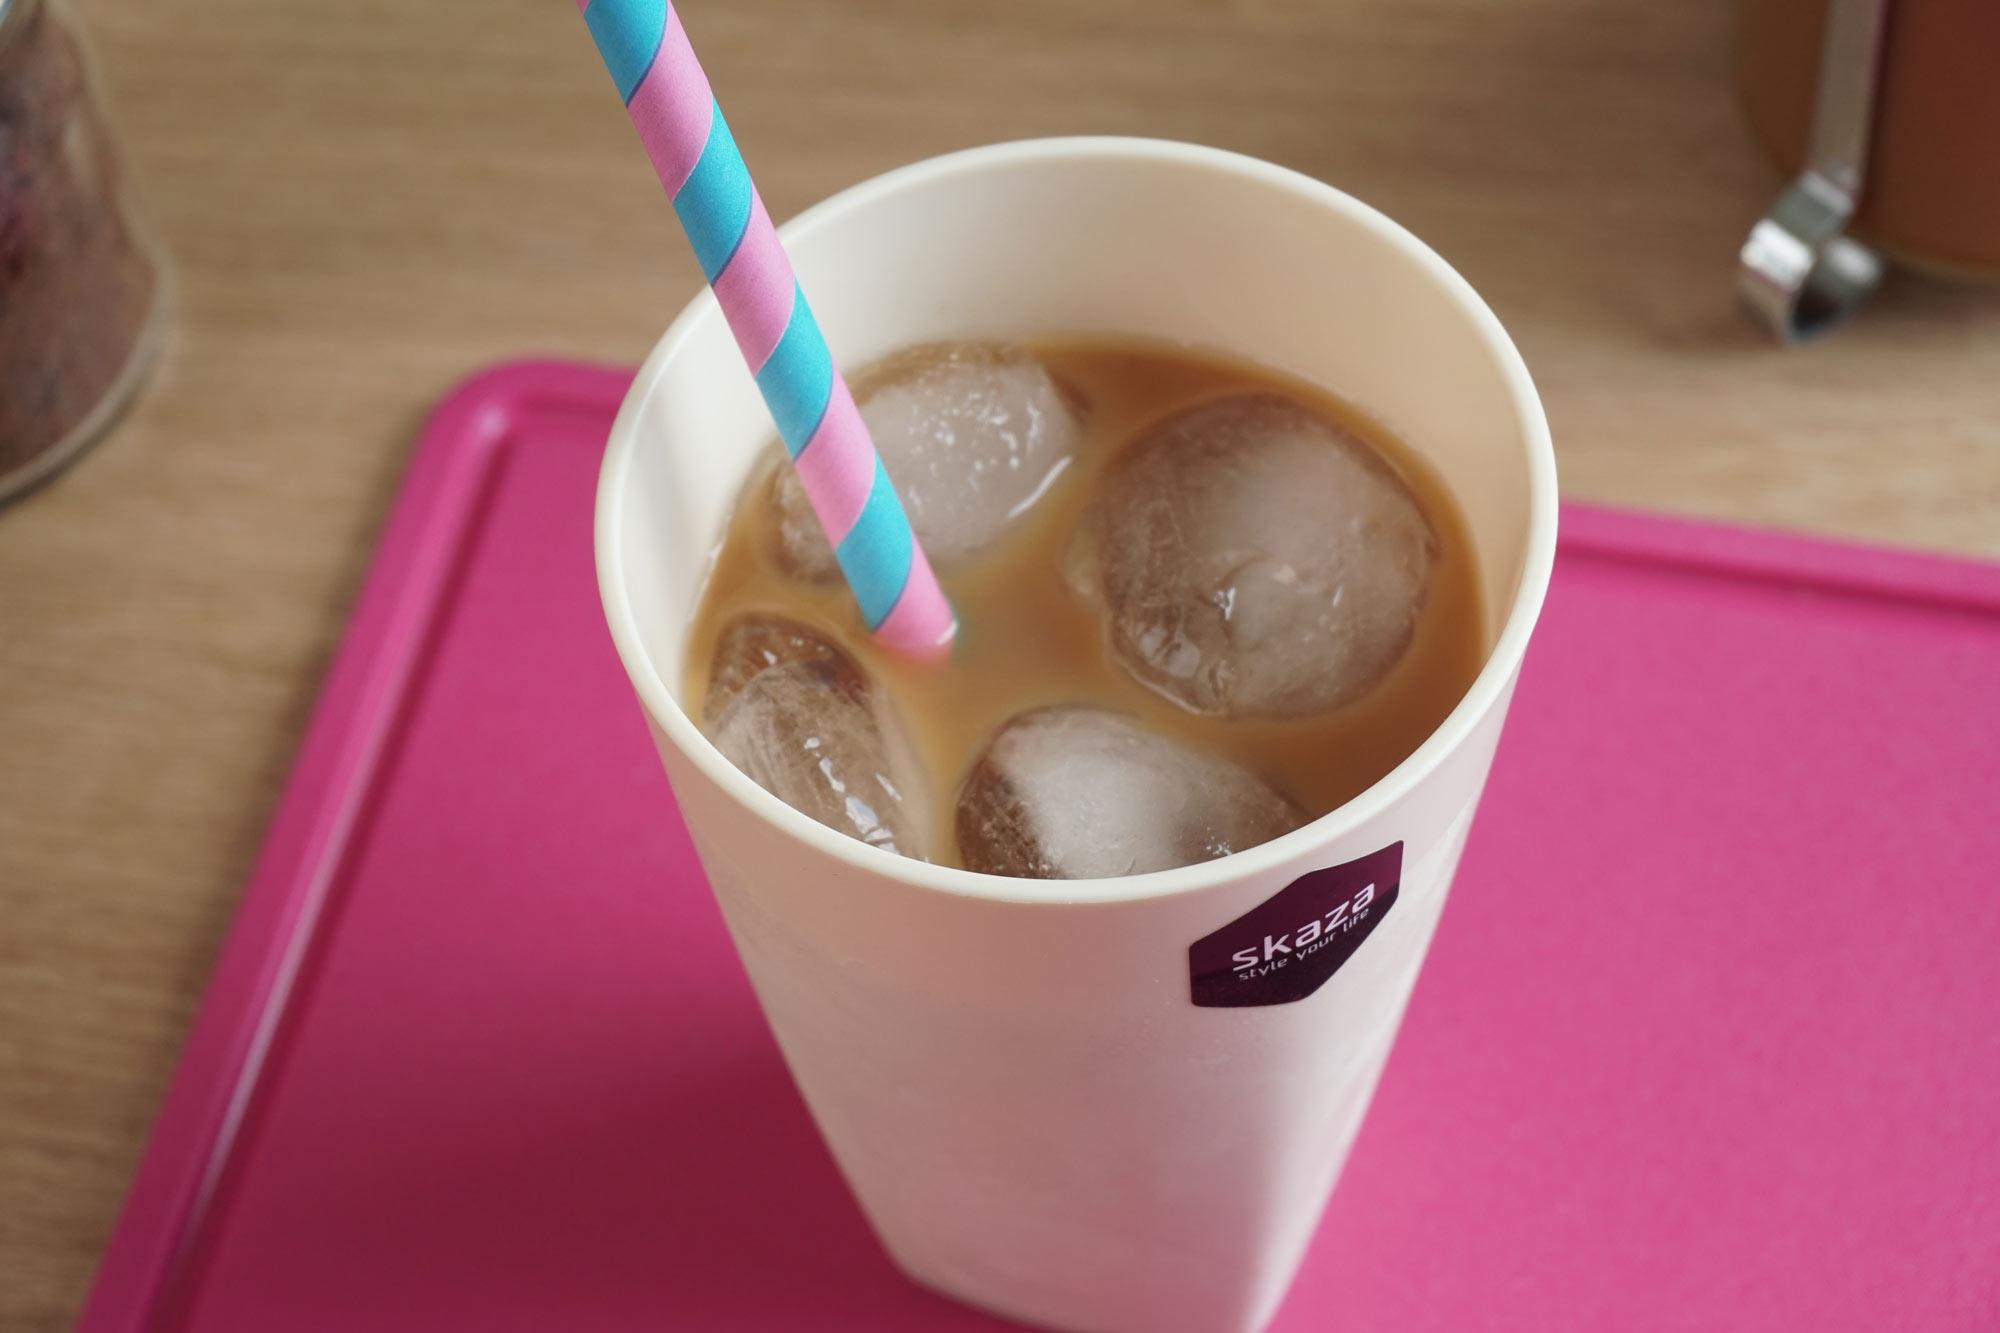 Ledena grška kava z riževim mlekom